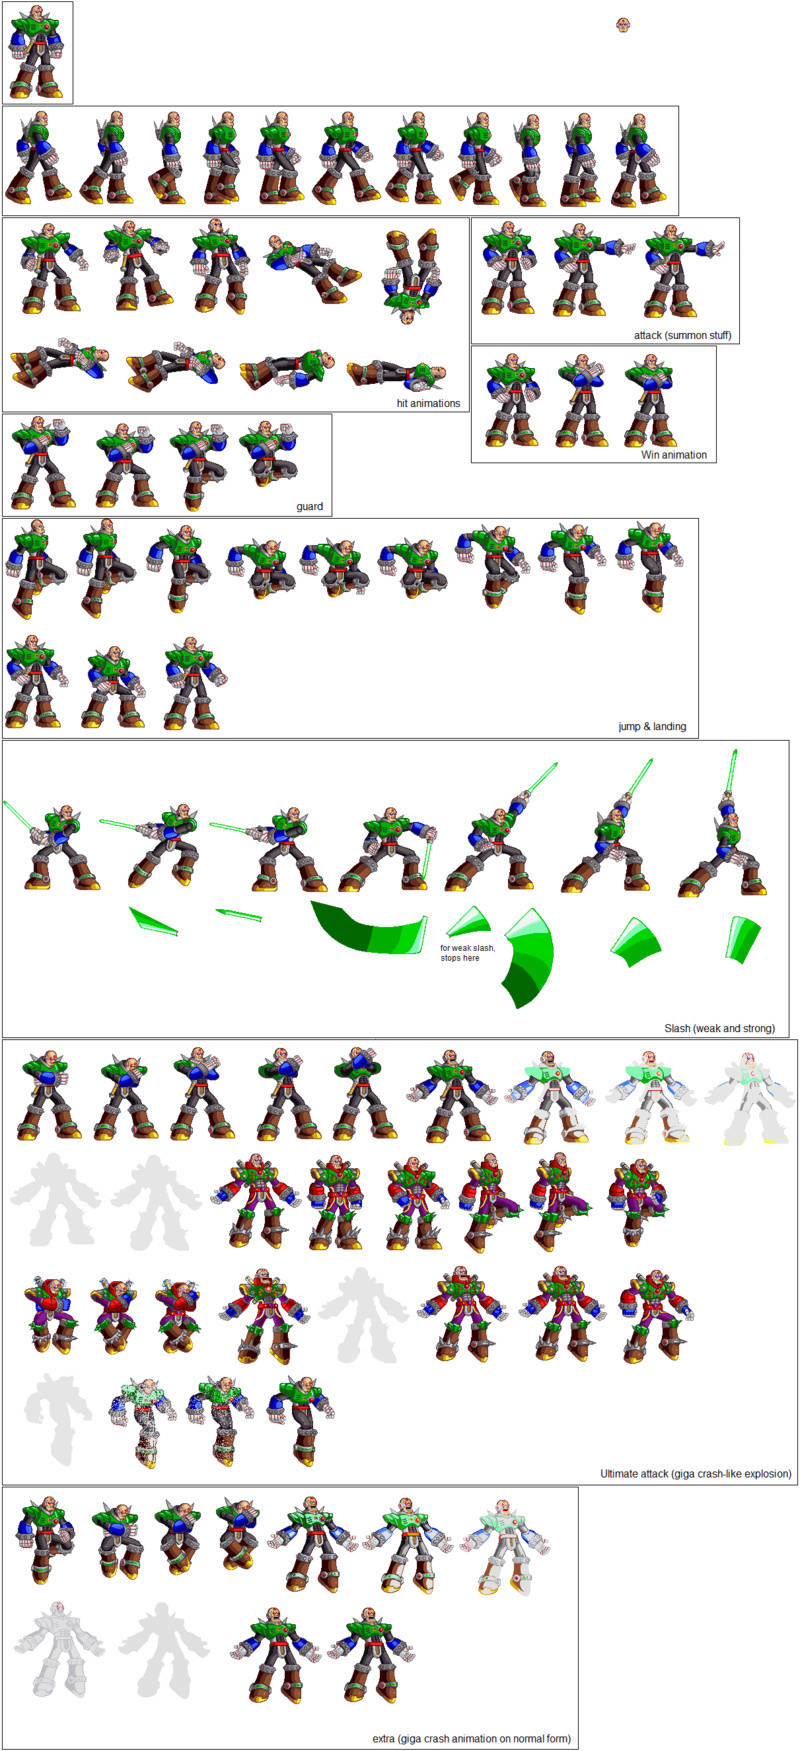 CvS Ultron! soon CvS Gamora - Page 5 Sigma_10